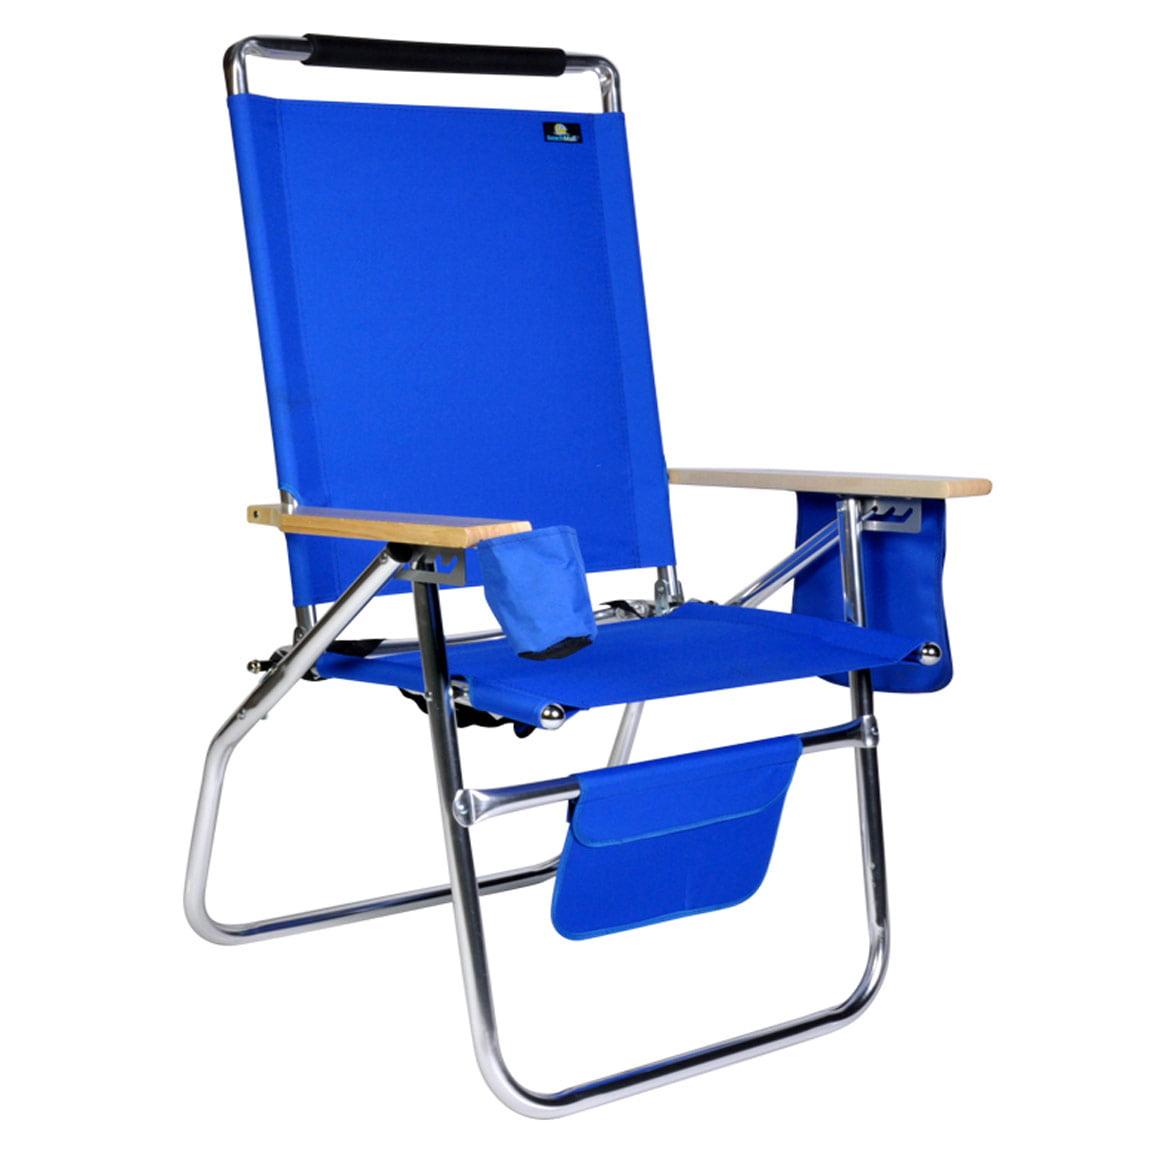 Deluxe 17 inch High Seat Aluminum Beach Chair